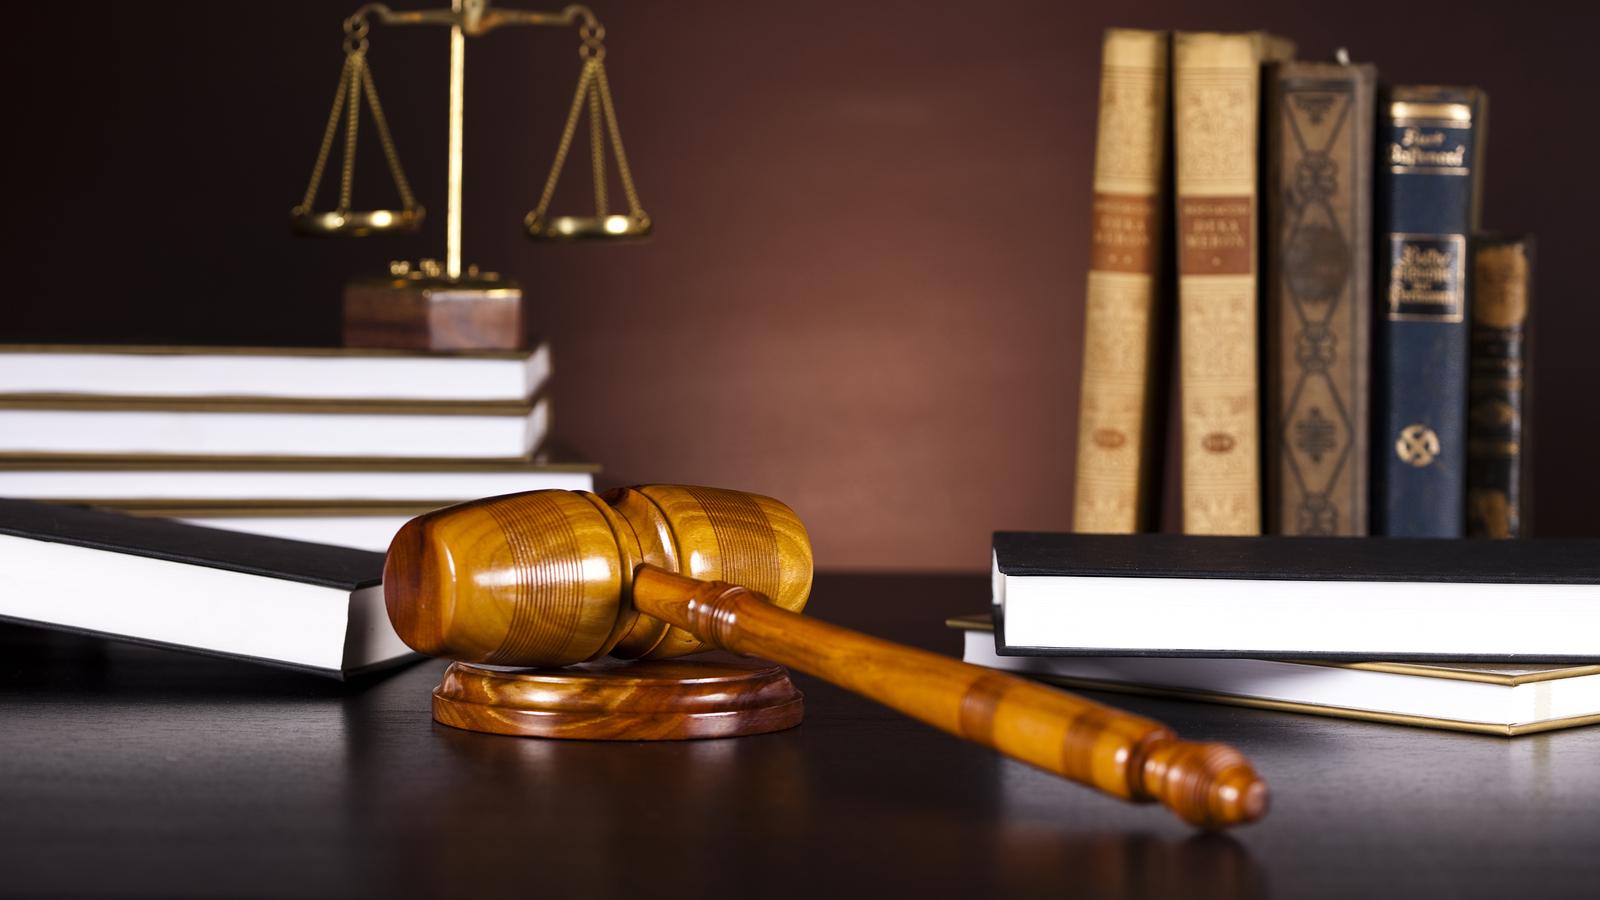 Best 56 Lawyer Wallpaper on HipWallpaper Lawyer Wallpaper 1600x900